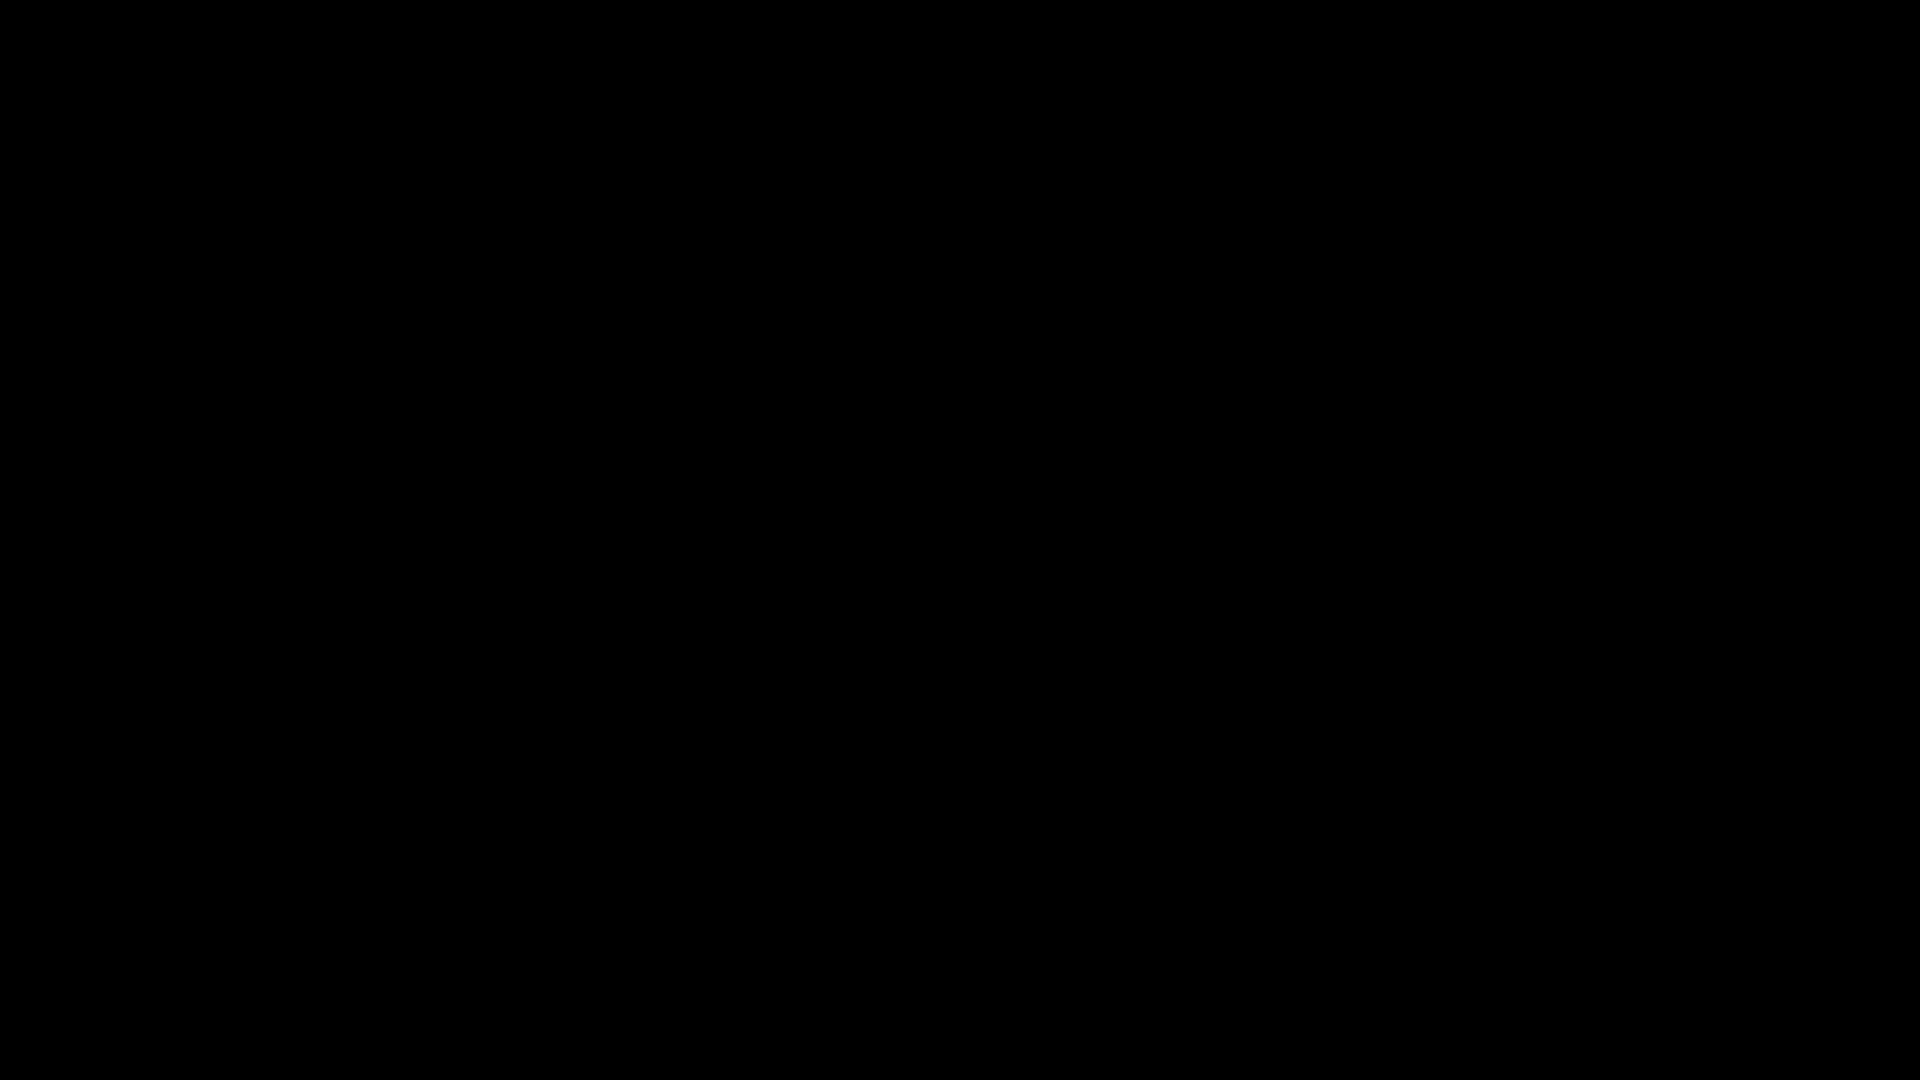 高画質露天女風呂観察 vol.032 女風呂 | OLのエロ生活  101連発 15